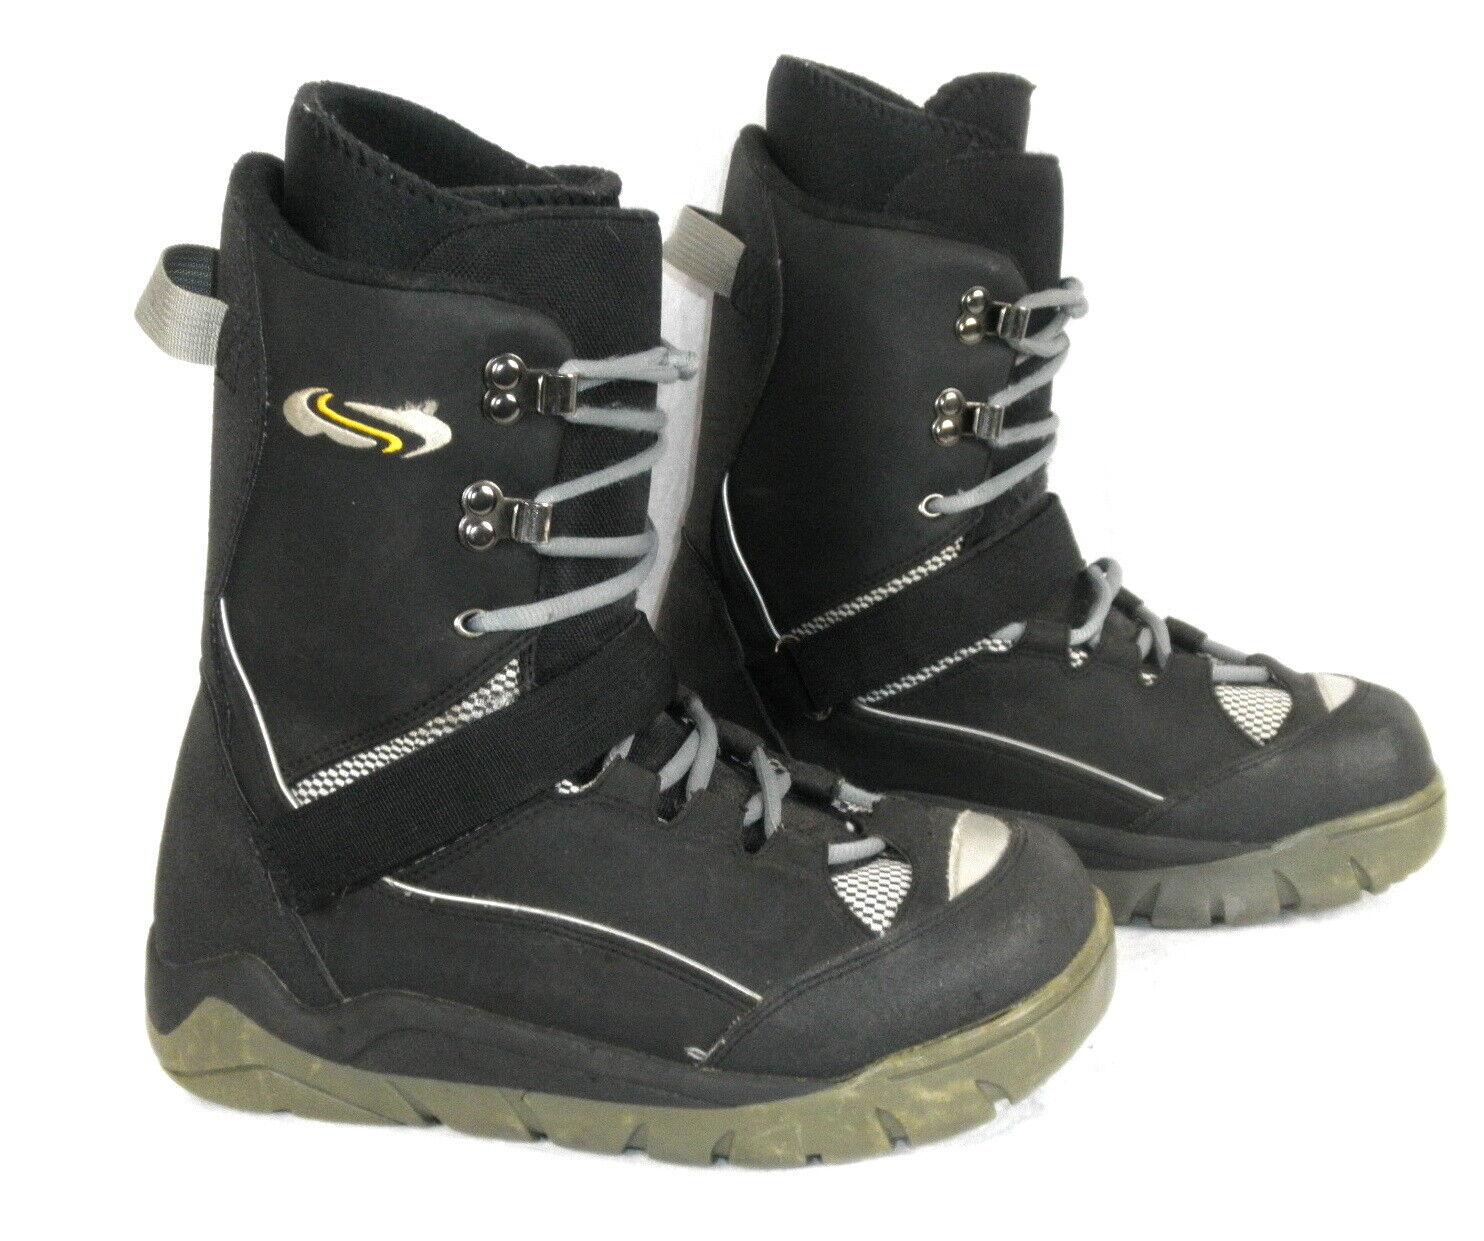 Alpine Downhill Ski Boots 9